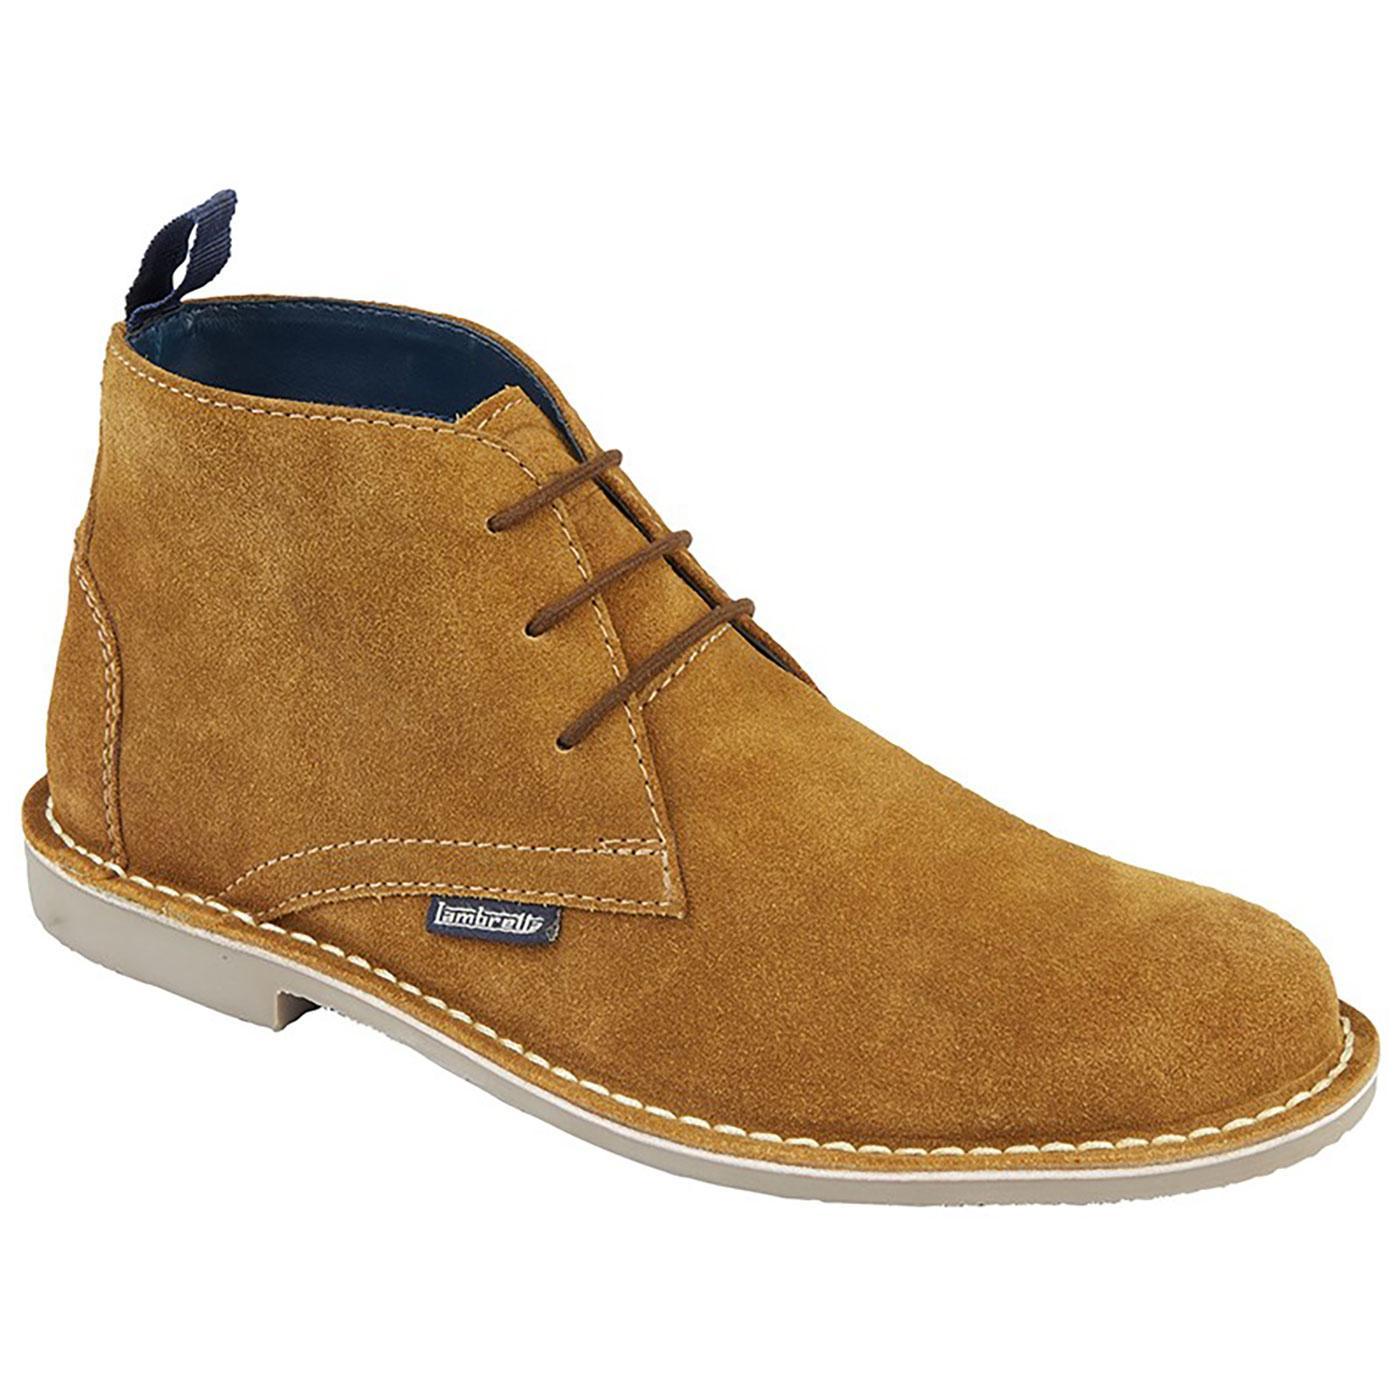 LAMBRETTA Men's 60s Mod Suede Desert Boots (Tan)